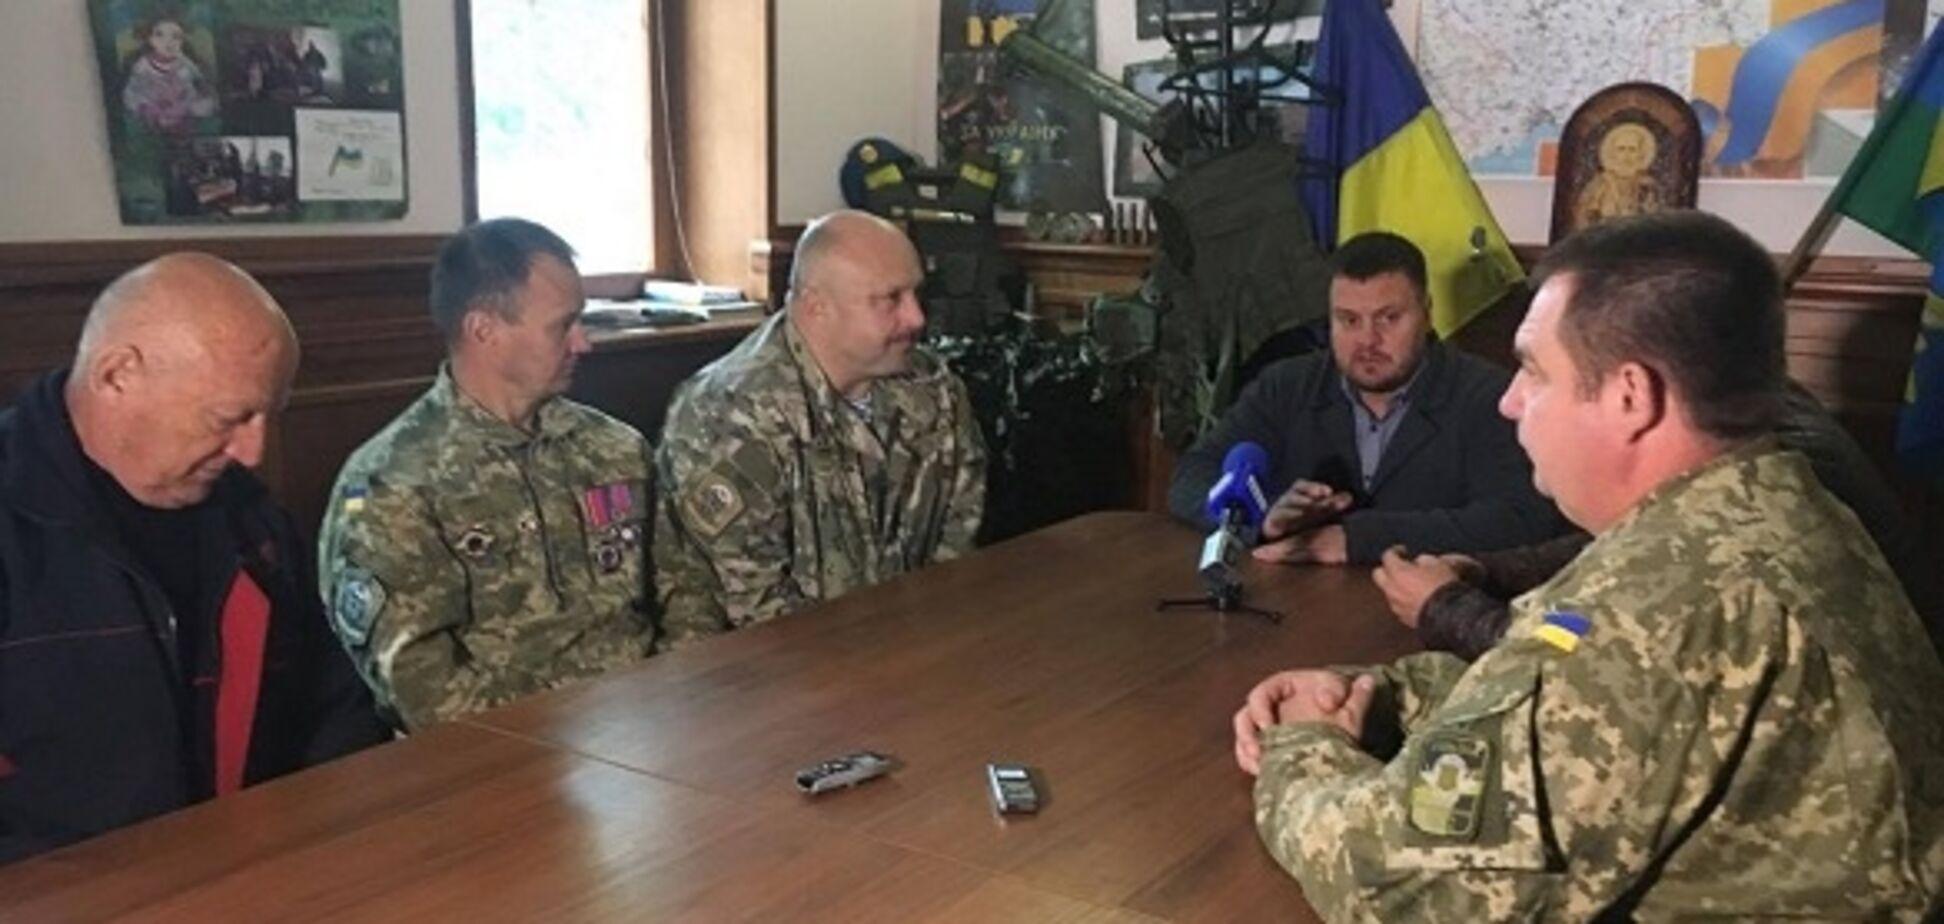 Убийство Бинусова: в Черкассах решение властей возмутило бойцов АТО